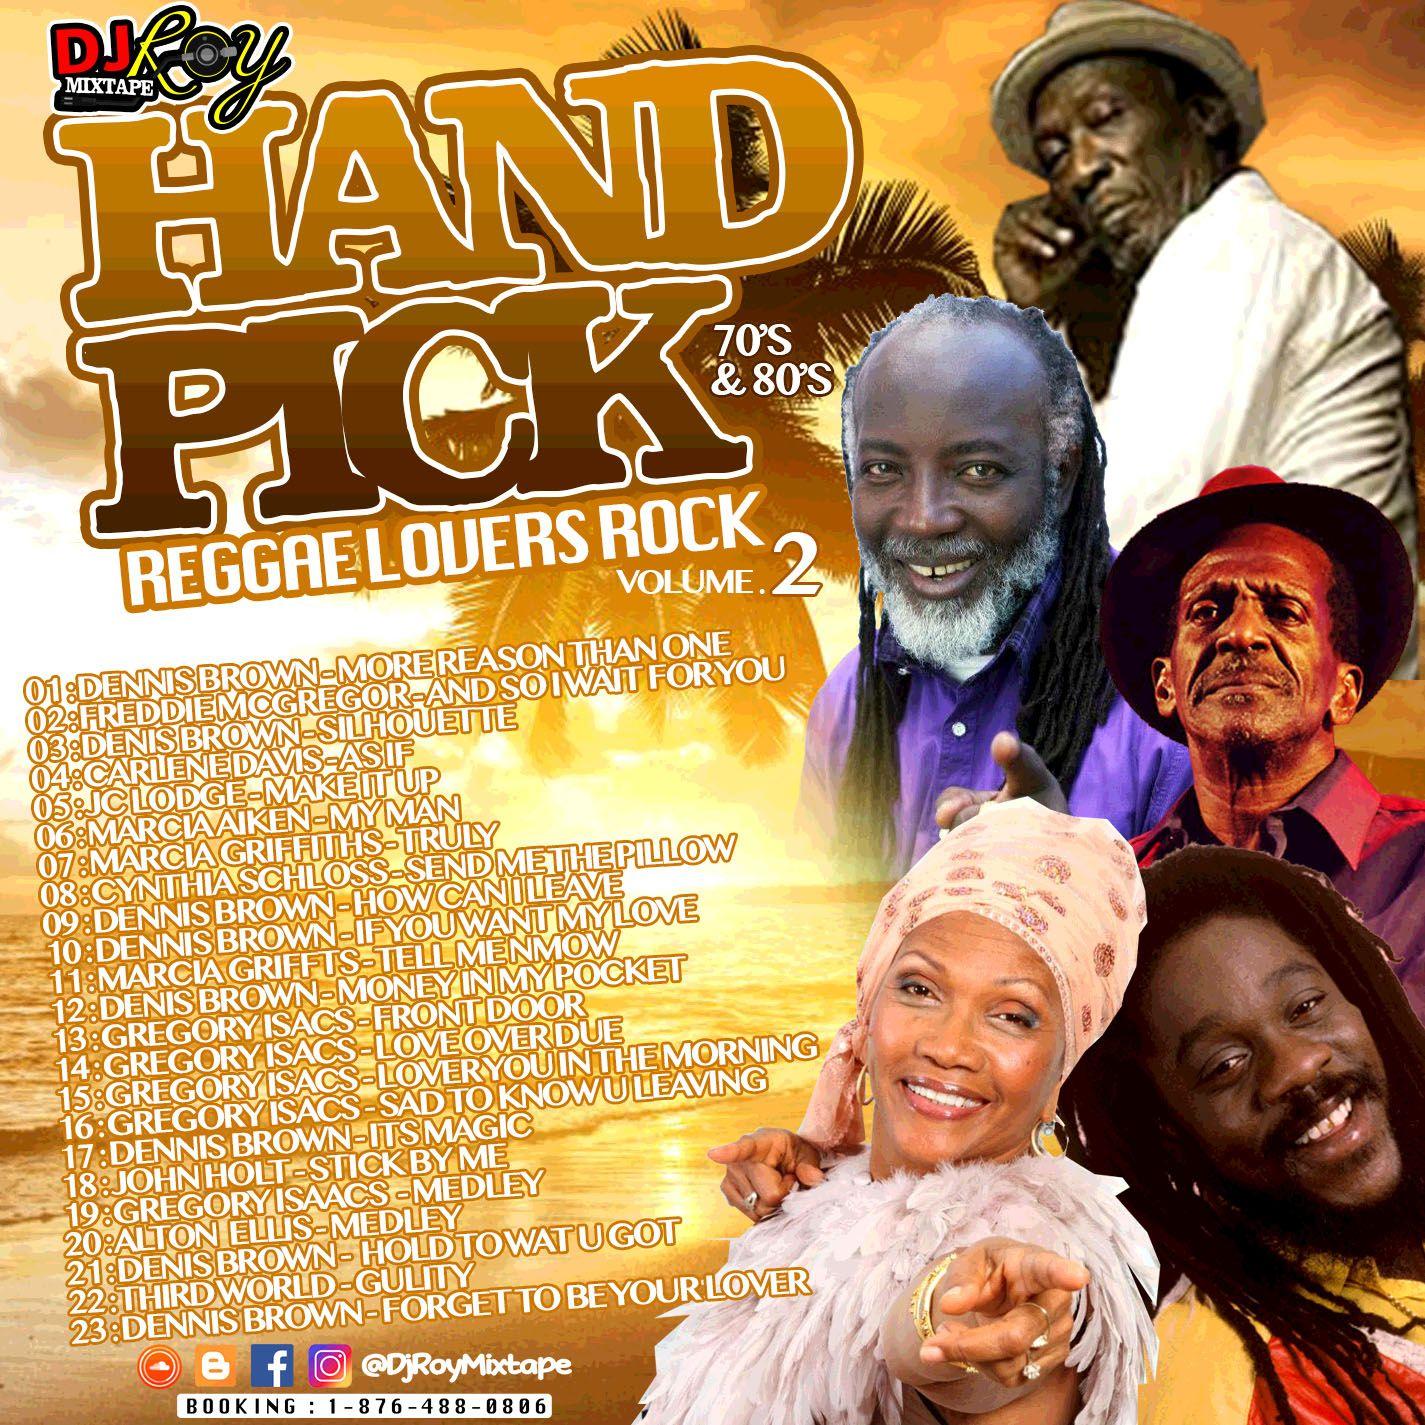 DJ ROY HAND PICK LOVERS ROCK REGGAE MIX VOL 2 2017 by